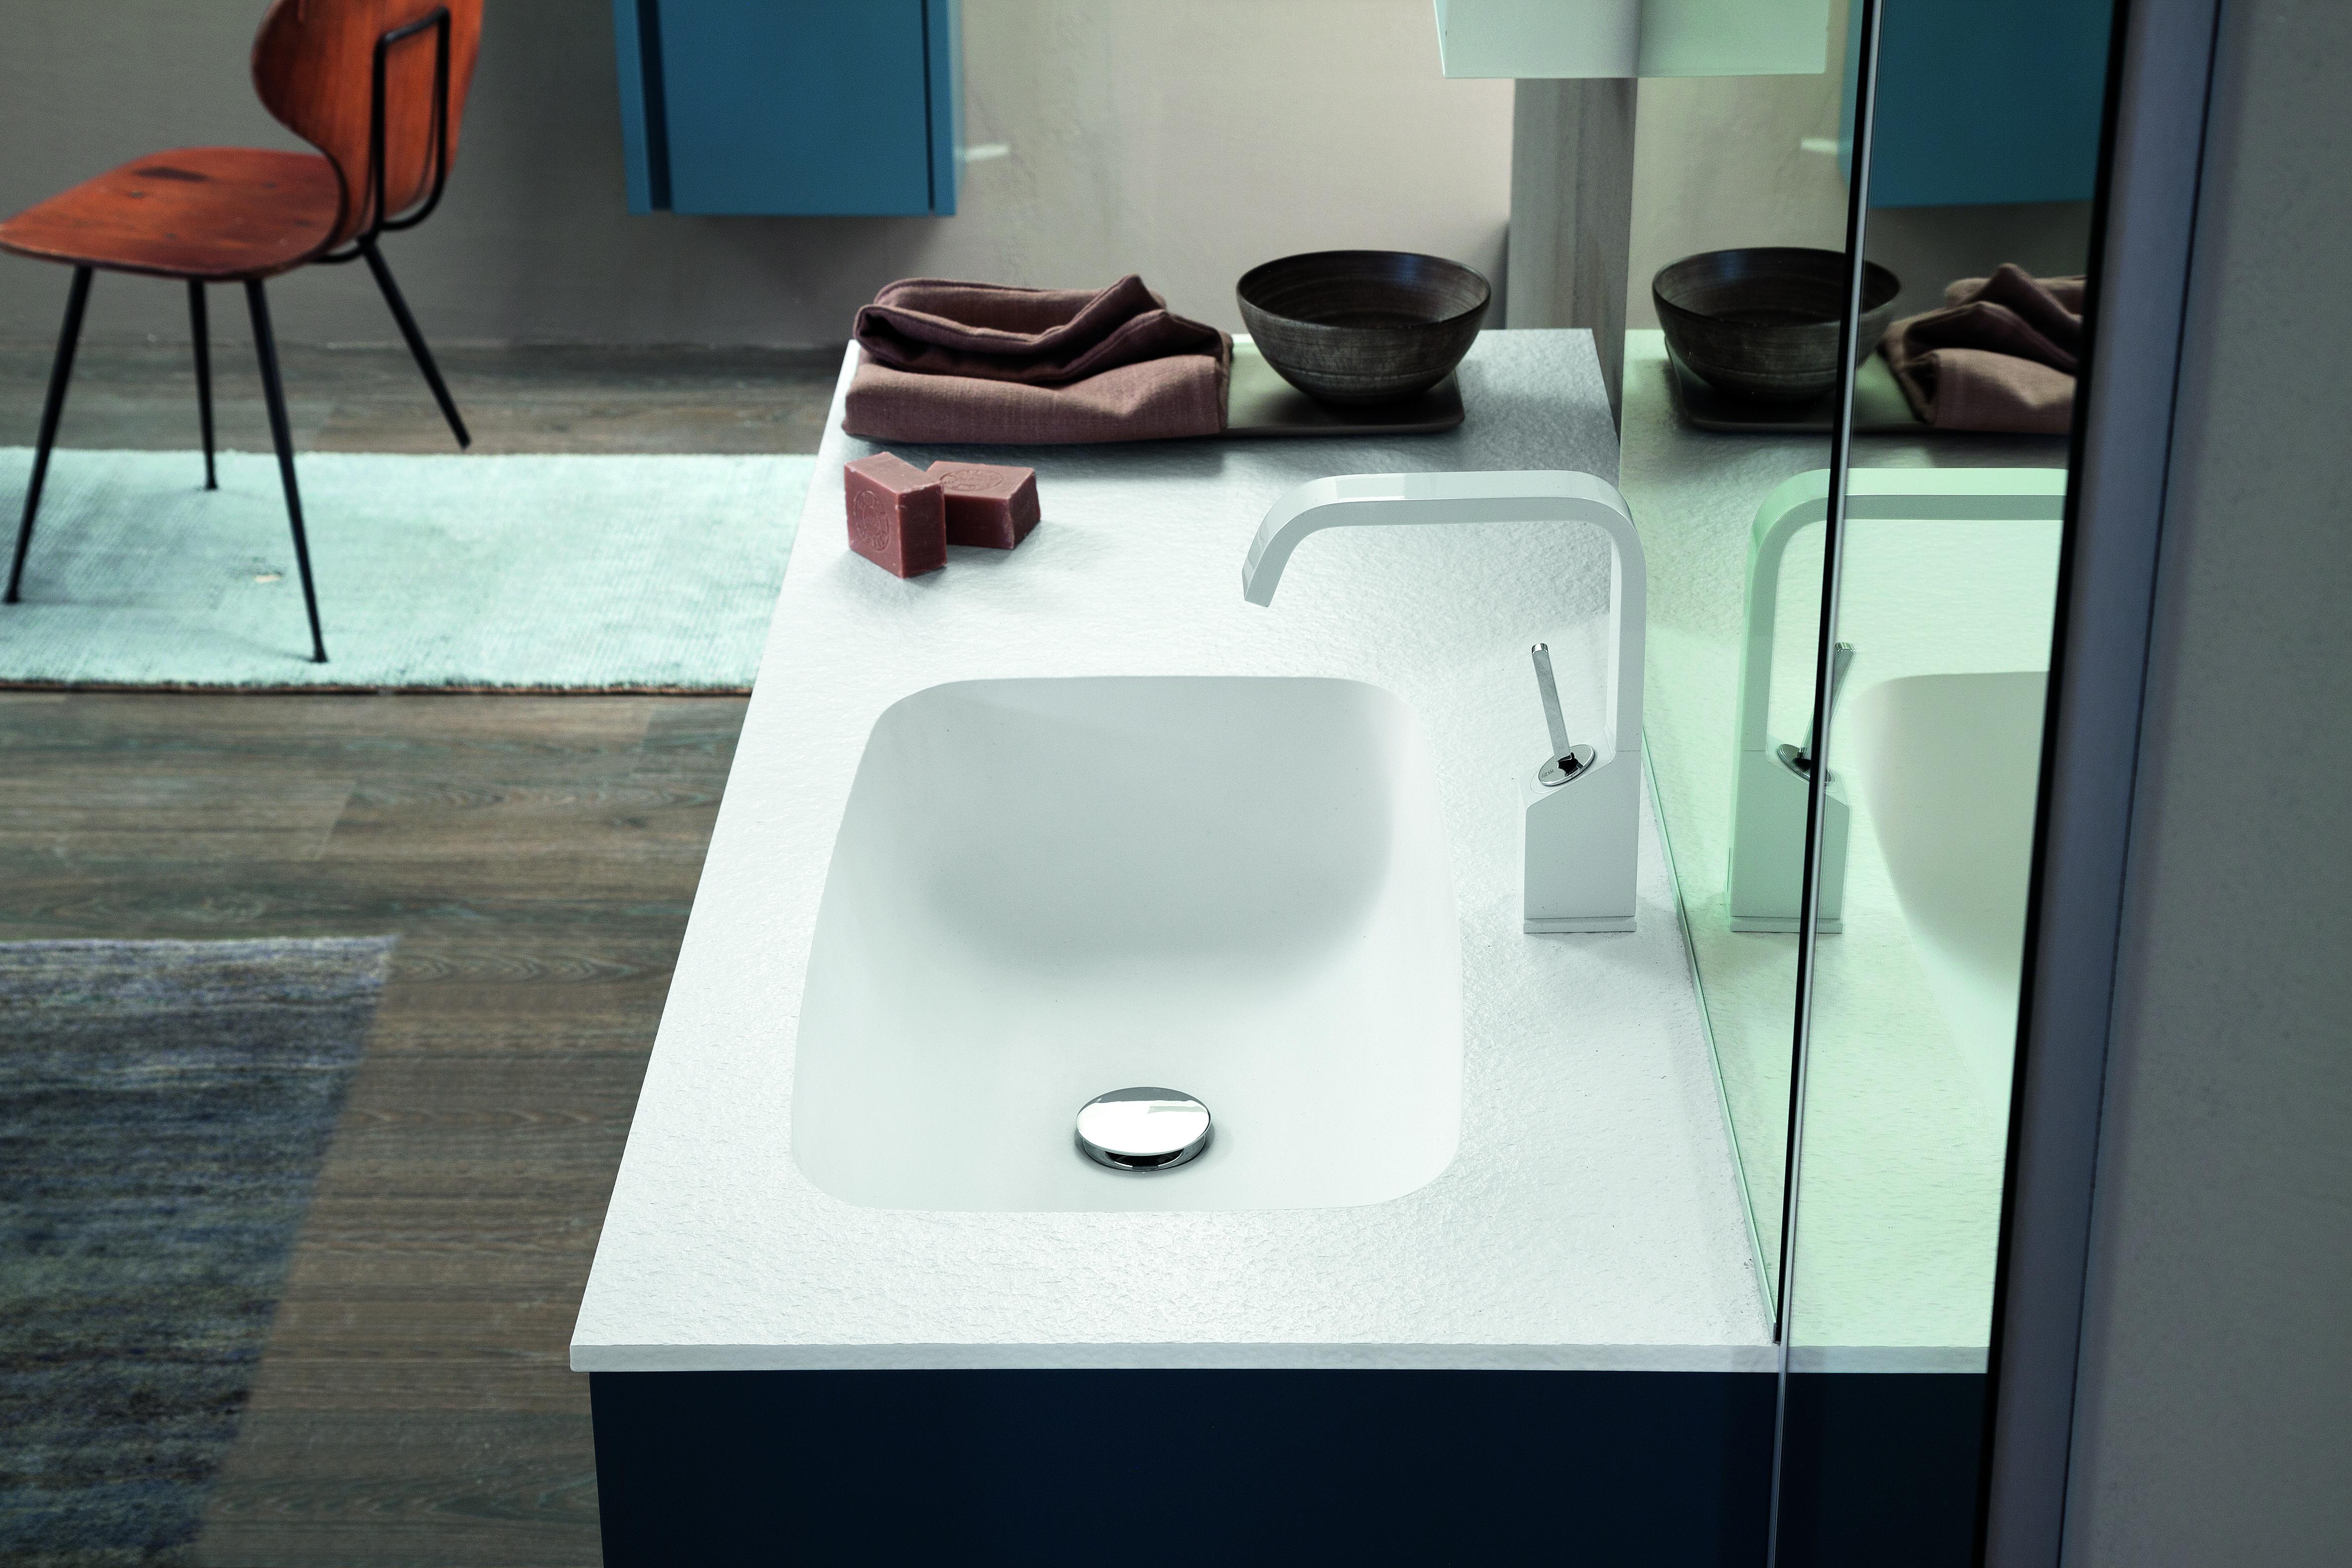 Ideas for decorating a small bathroom | Mastella Magazine